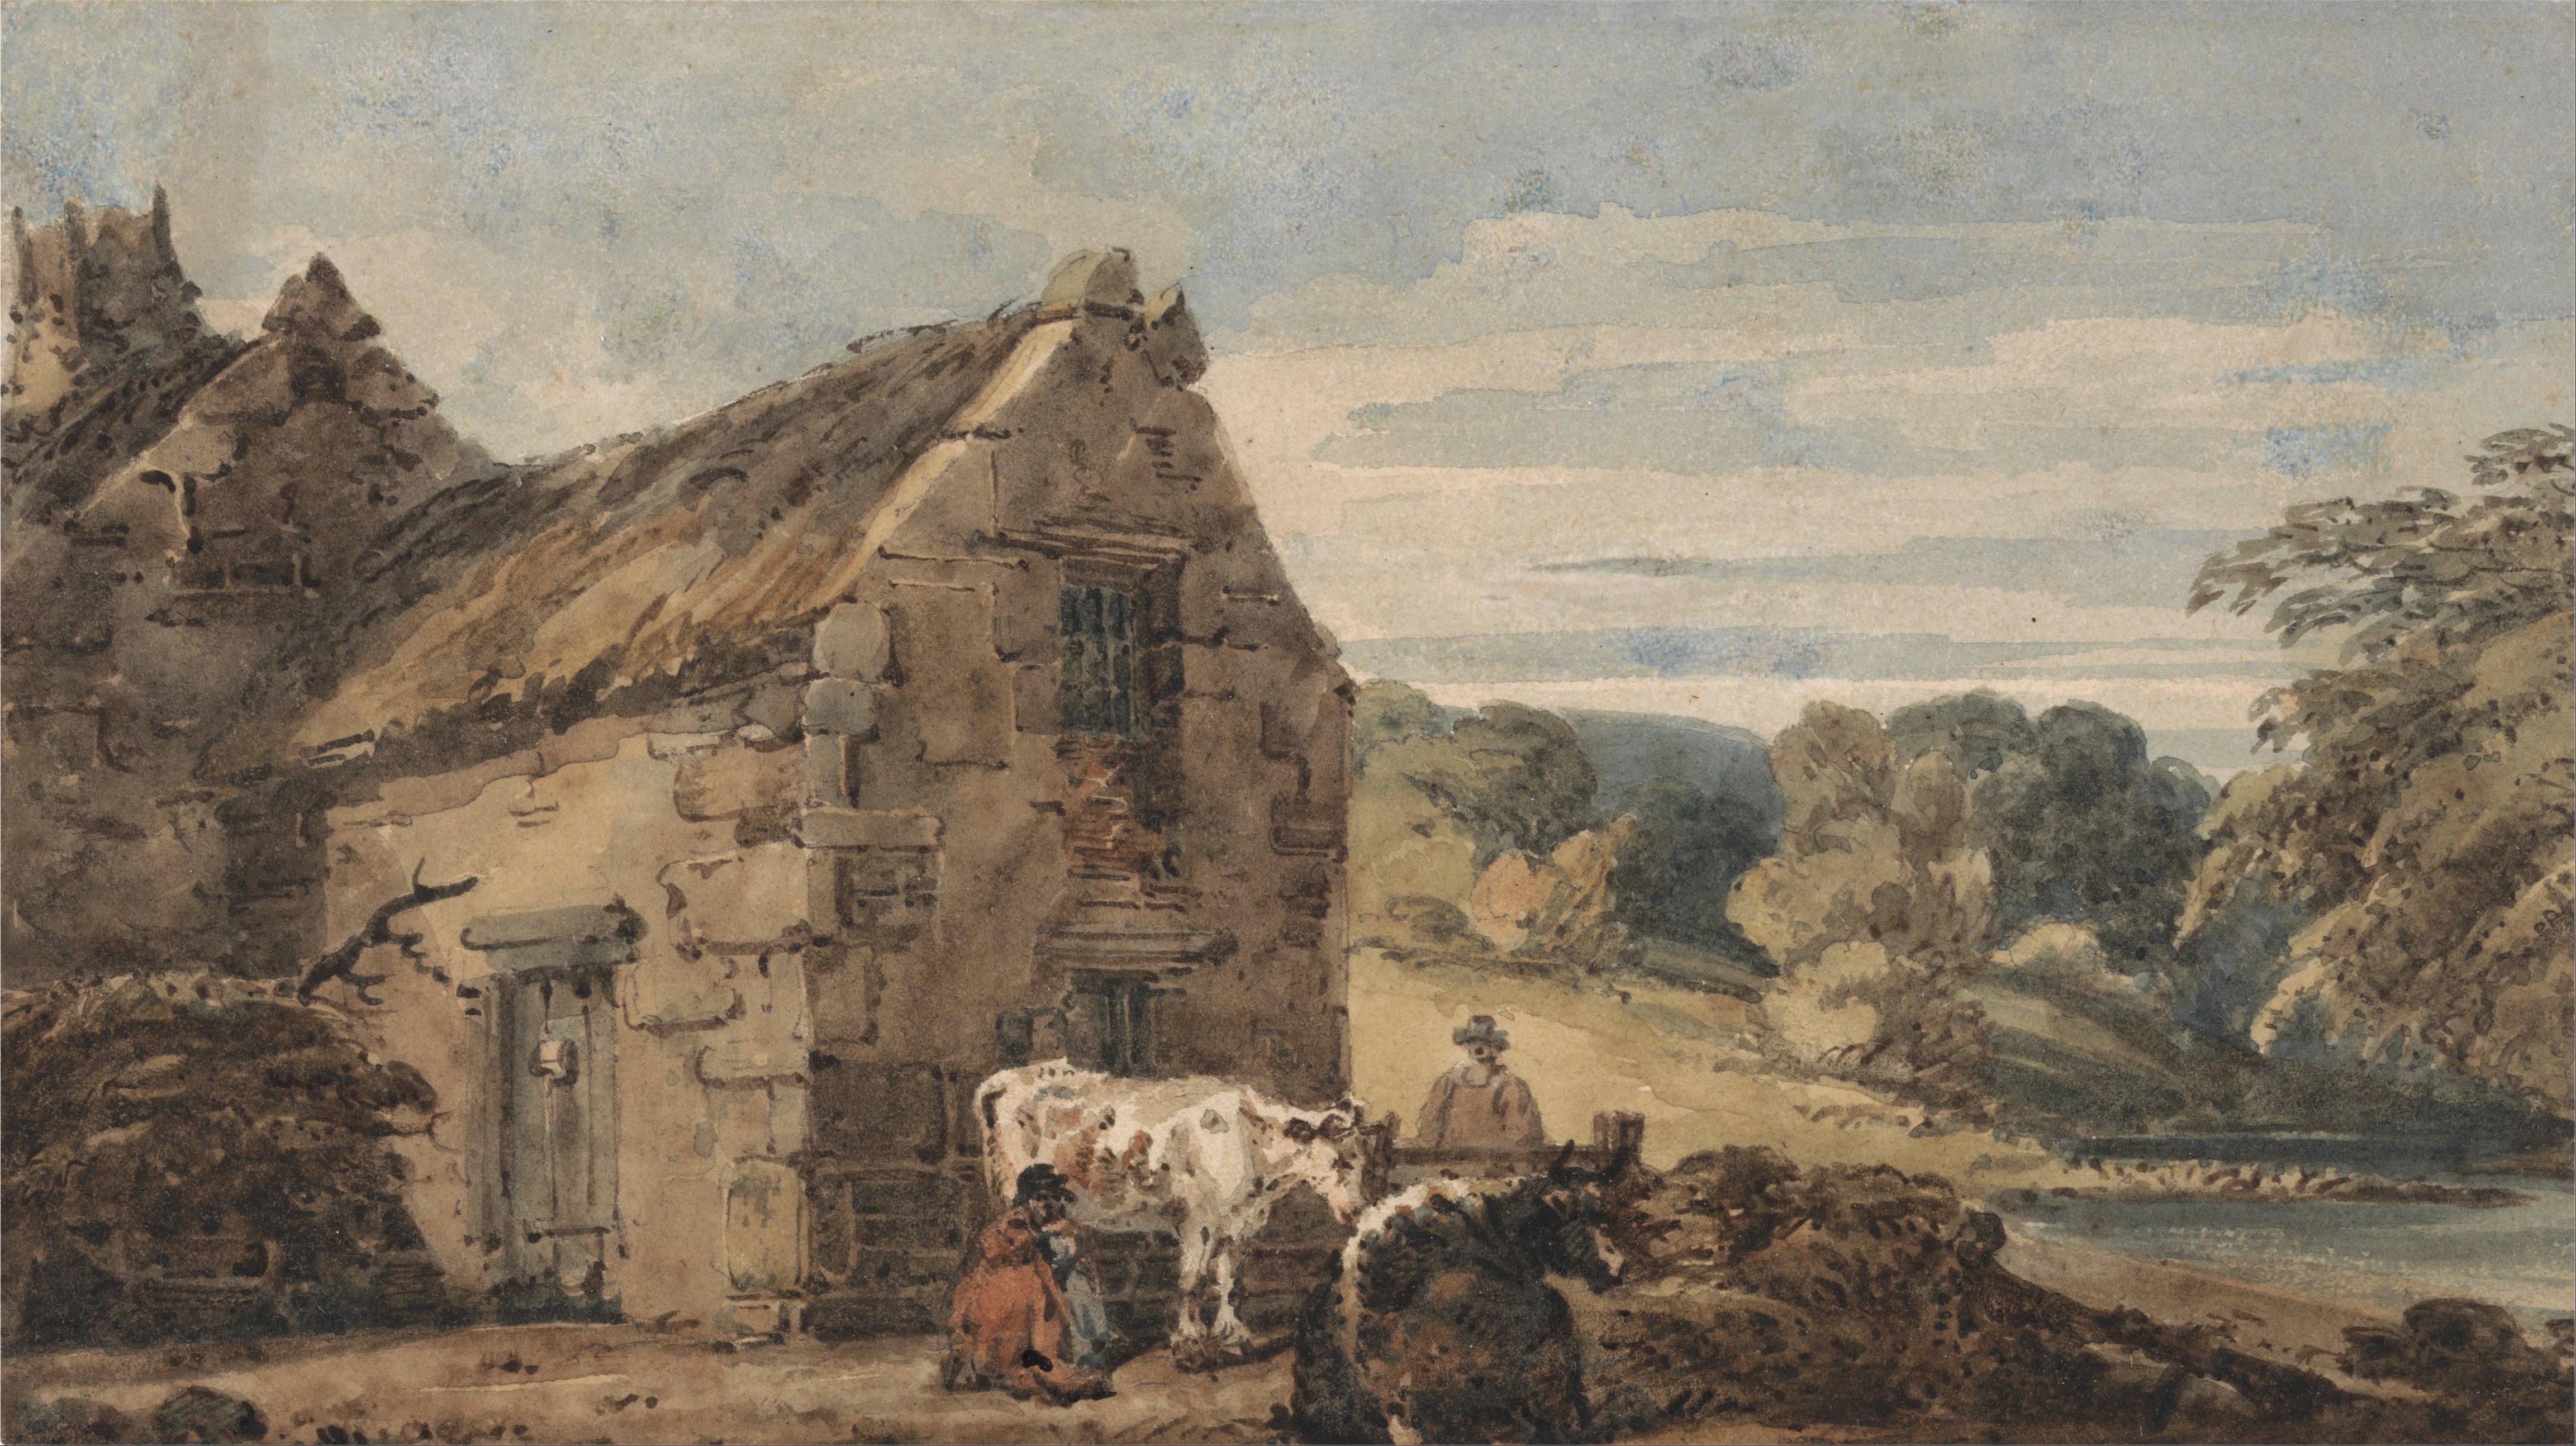 Thomas_Girtin_-_Cottage_near_Newcastle,_Northumberland_-_Google_Art_Project